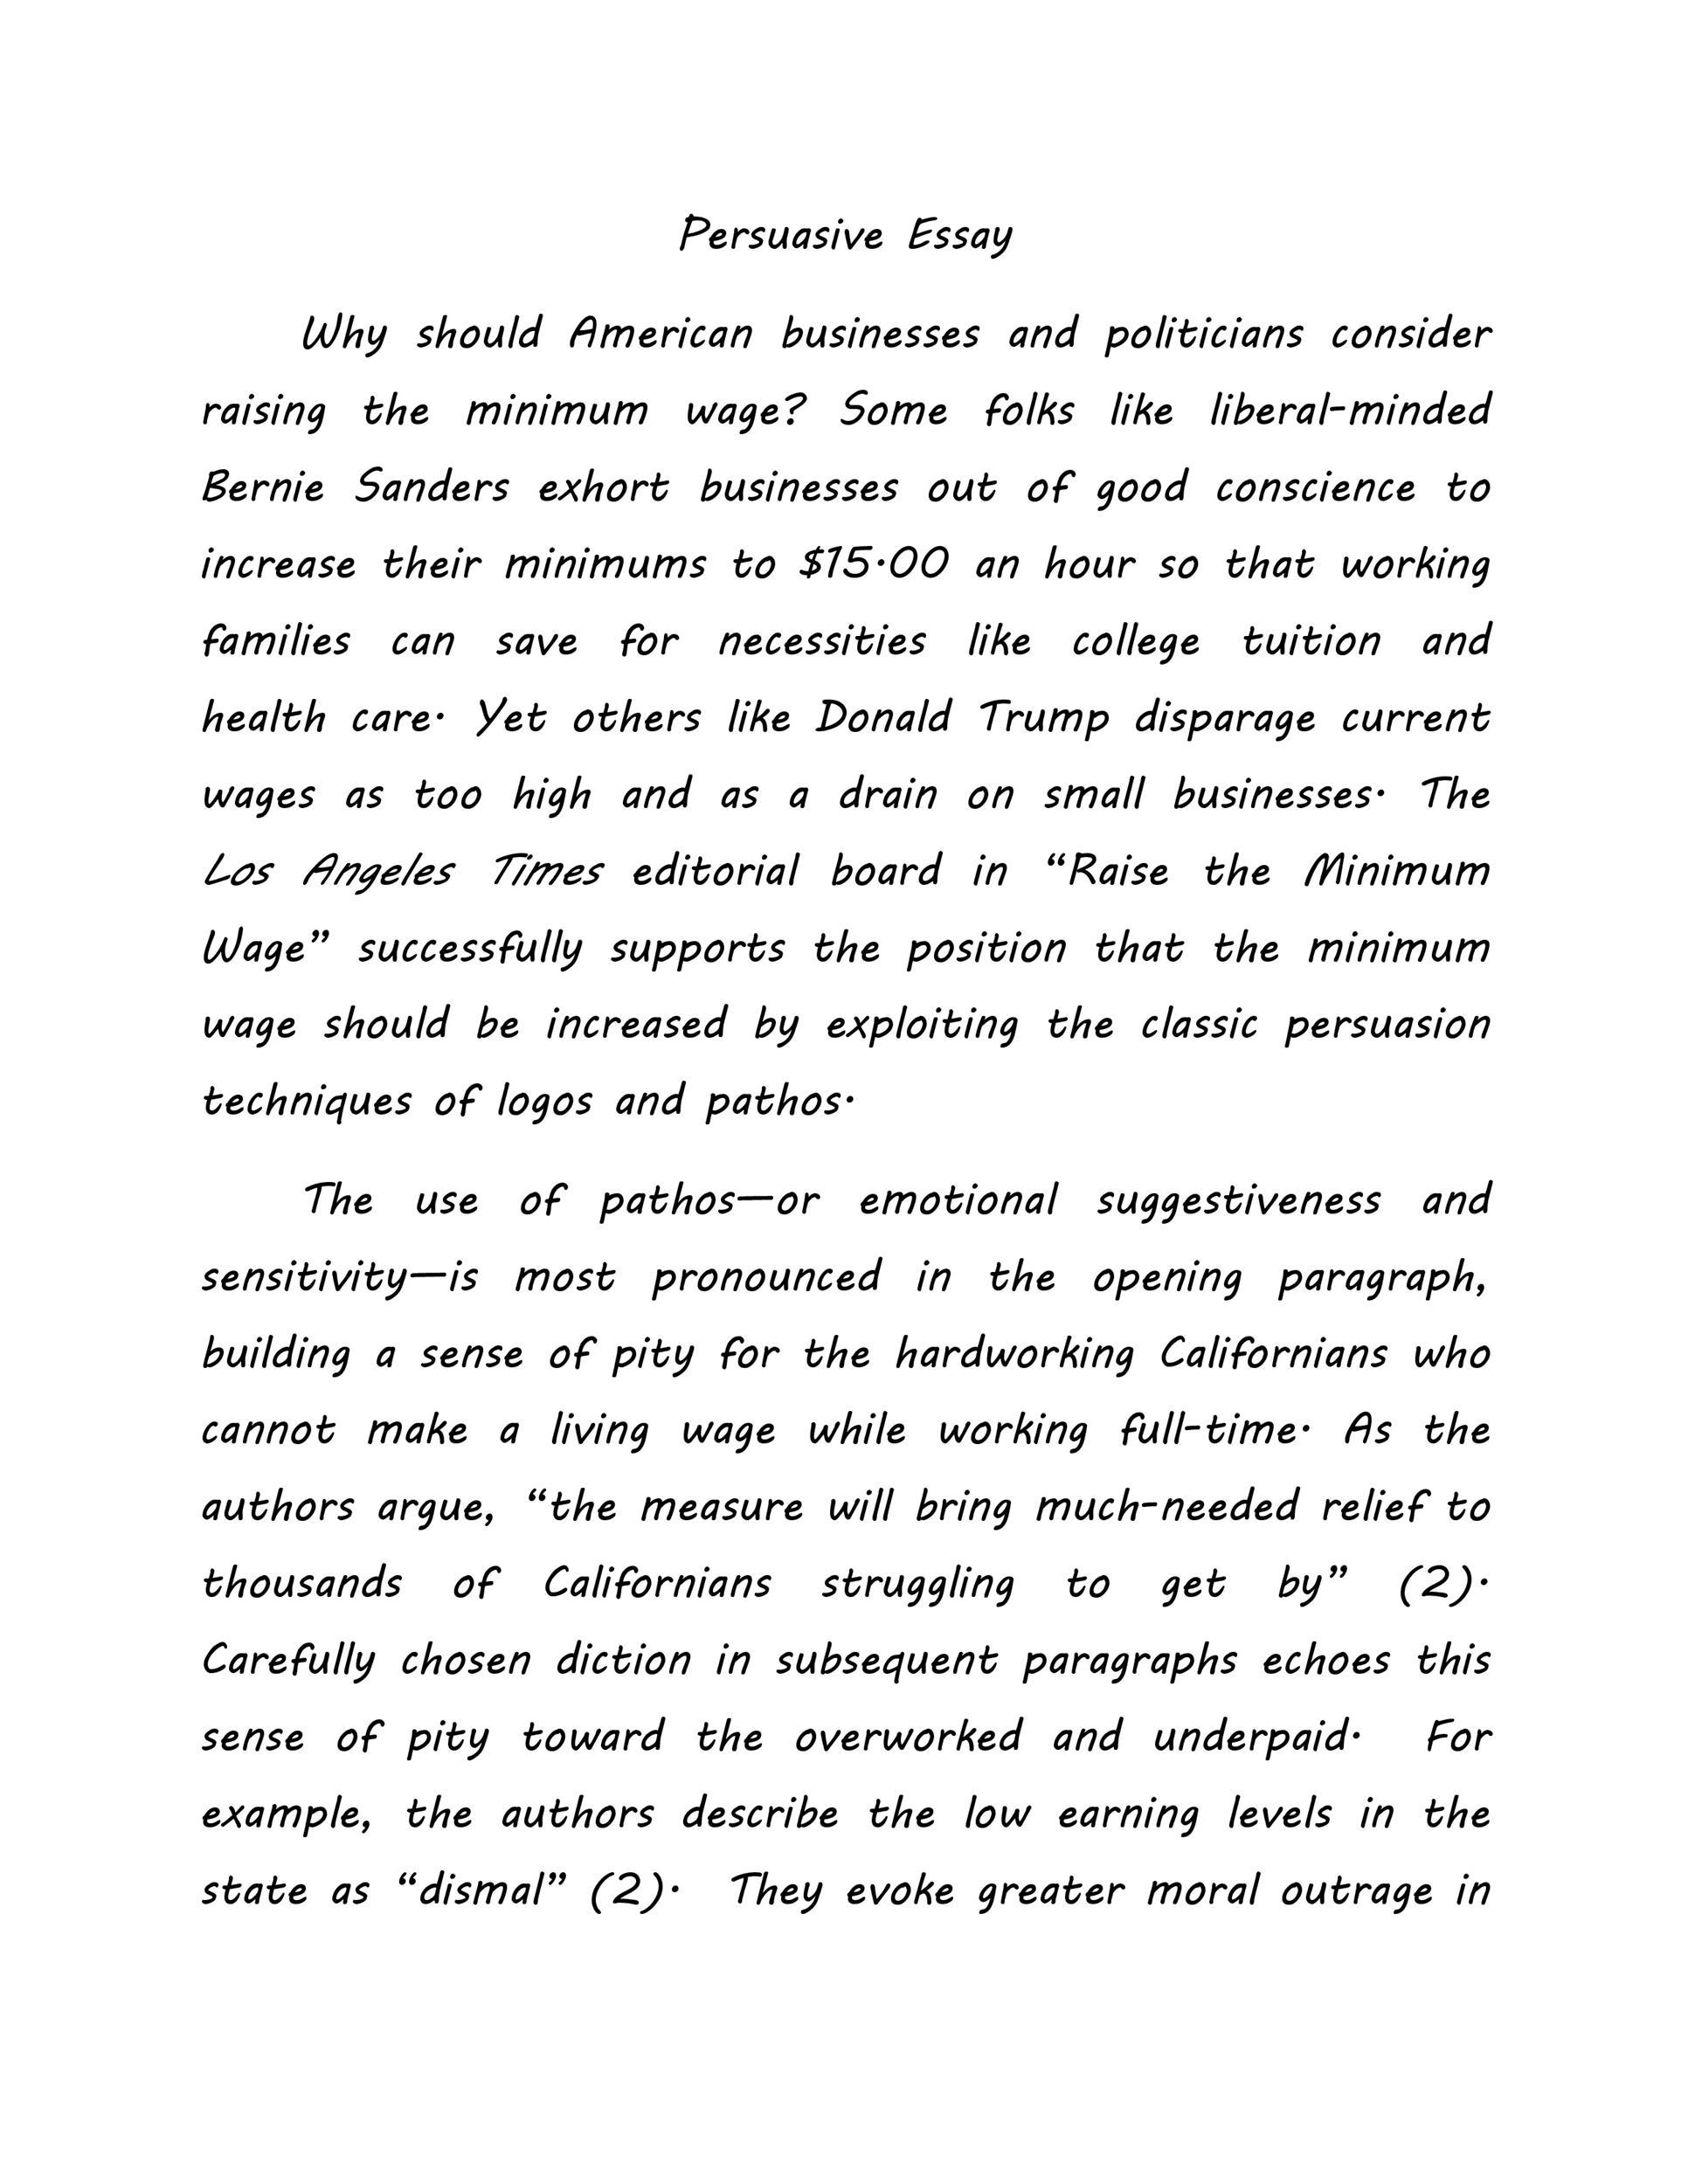 Free persuasive essay example 26